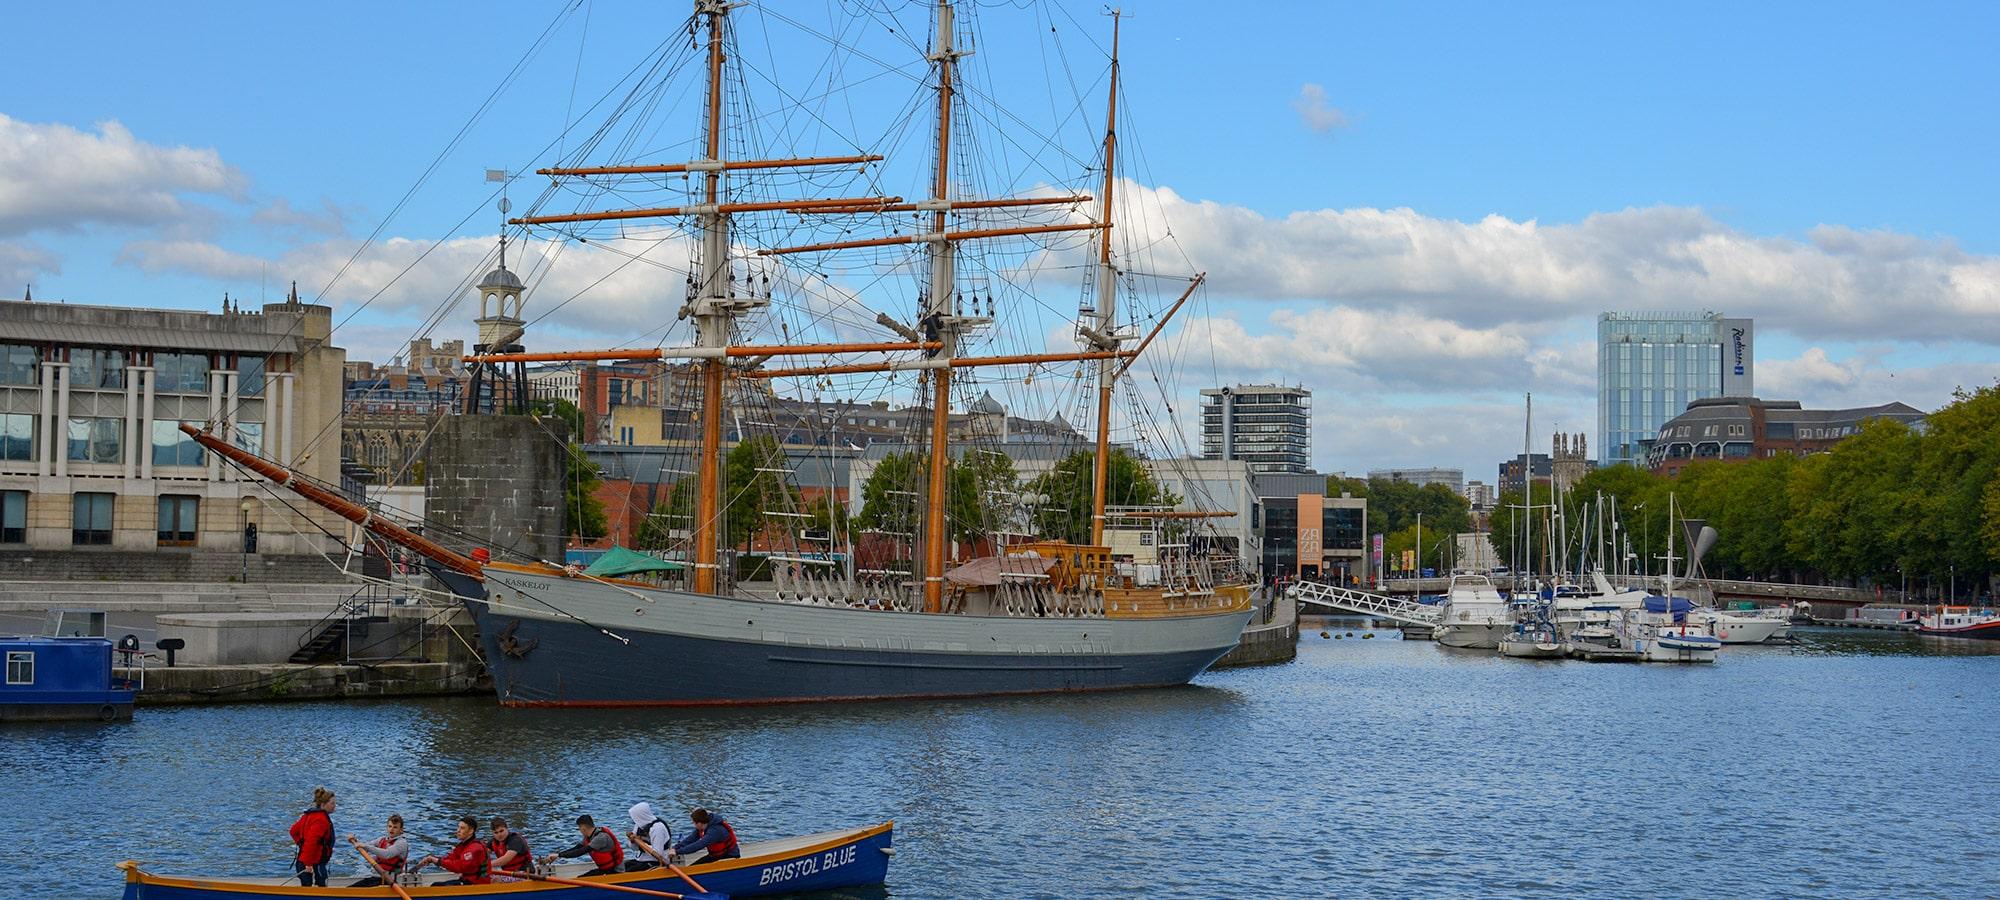 Wapping Wharf